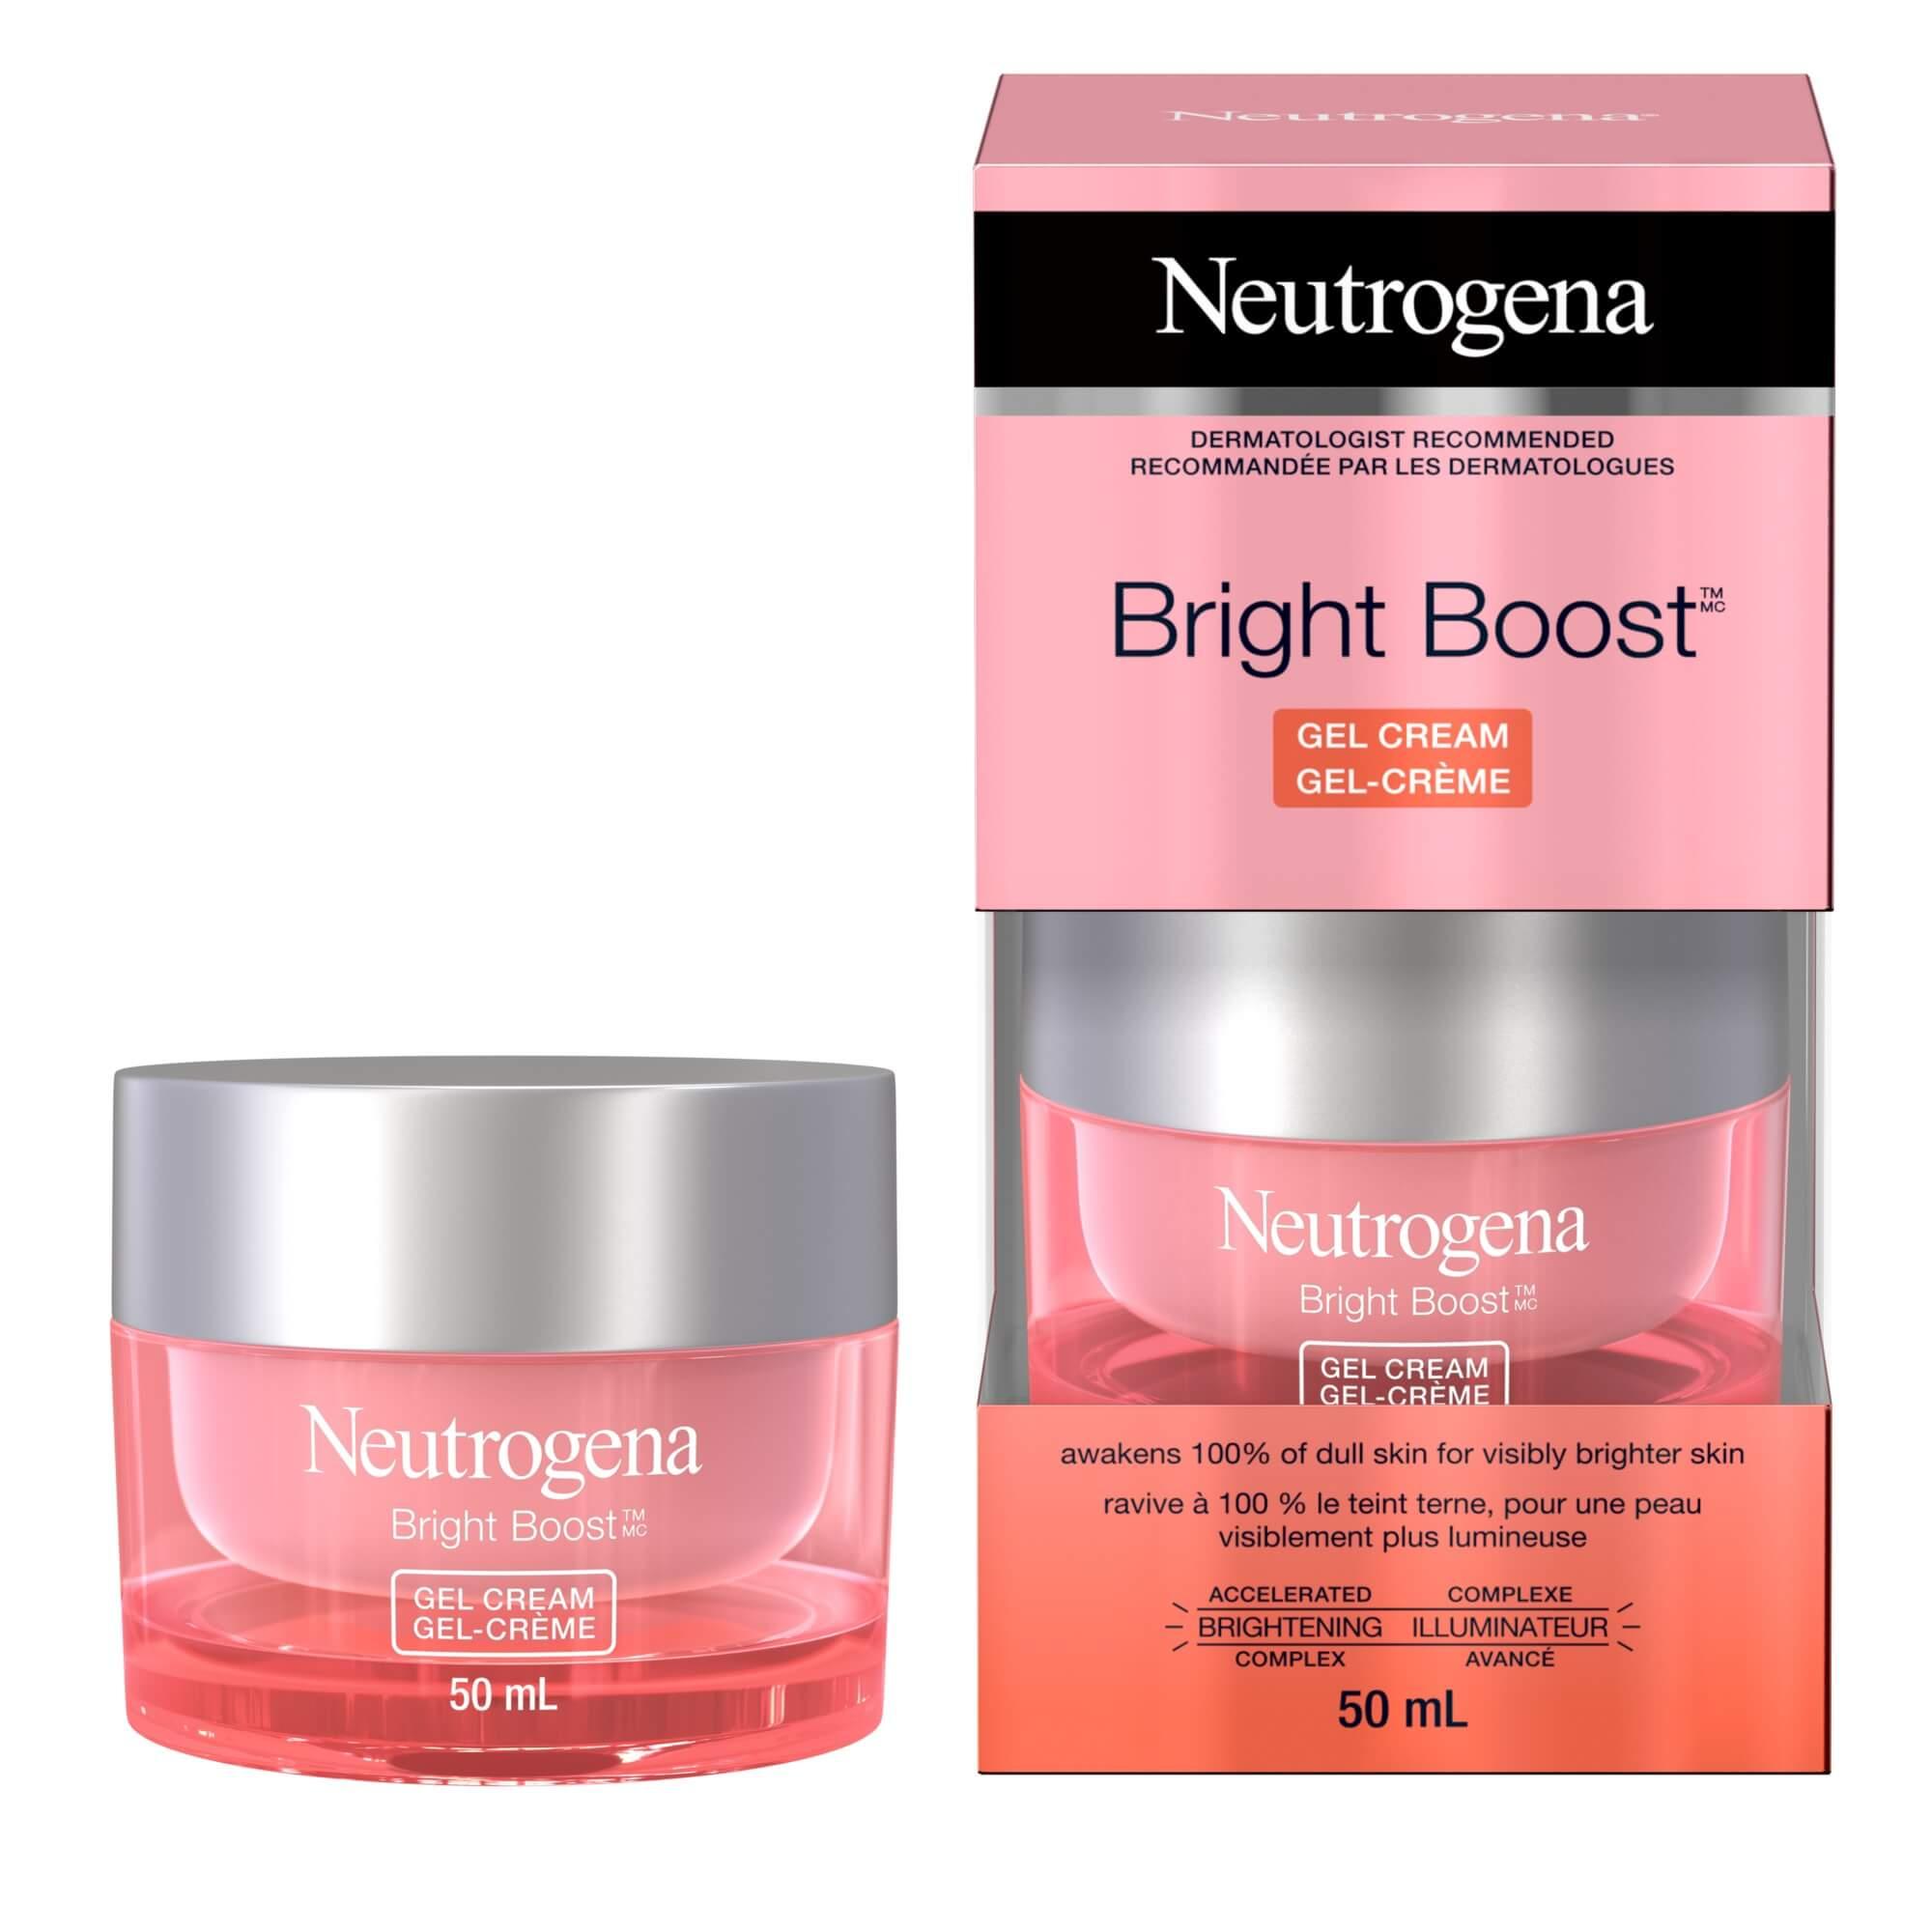 Gel-crème Neutrogena Bright BoostMC, 50 ml